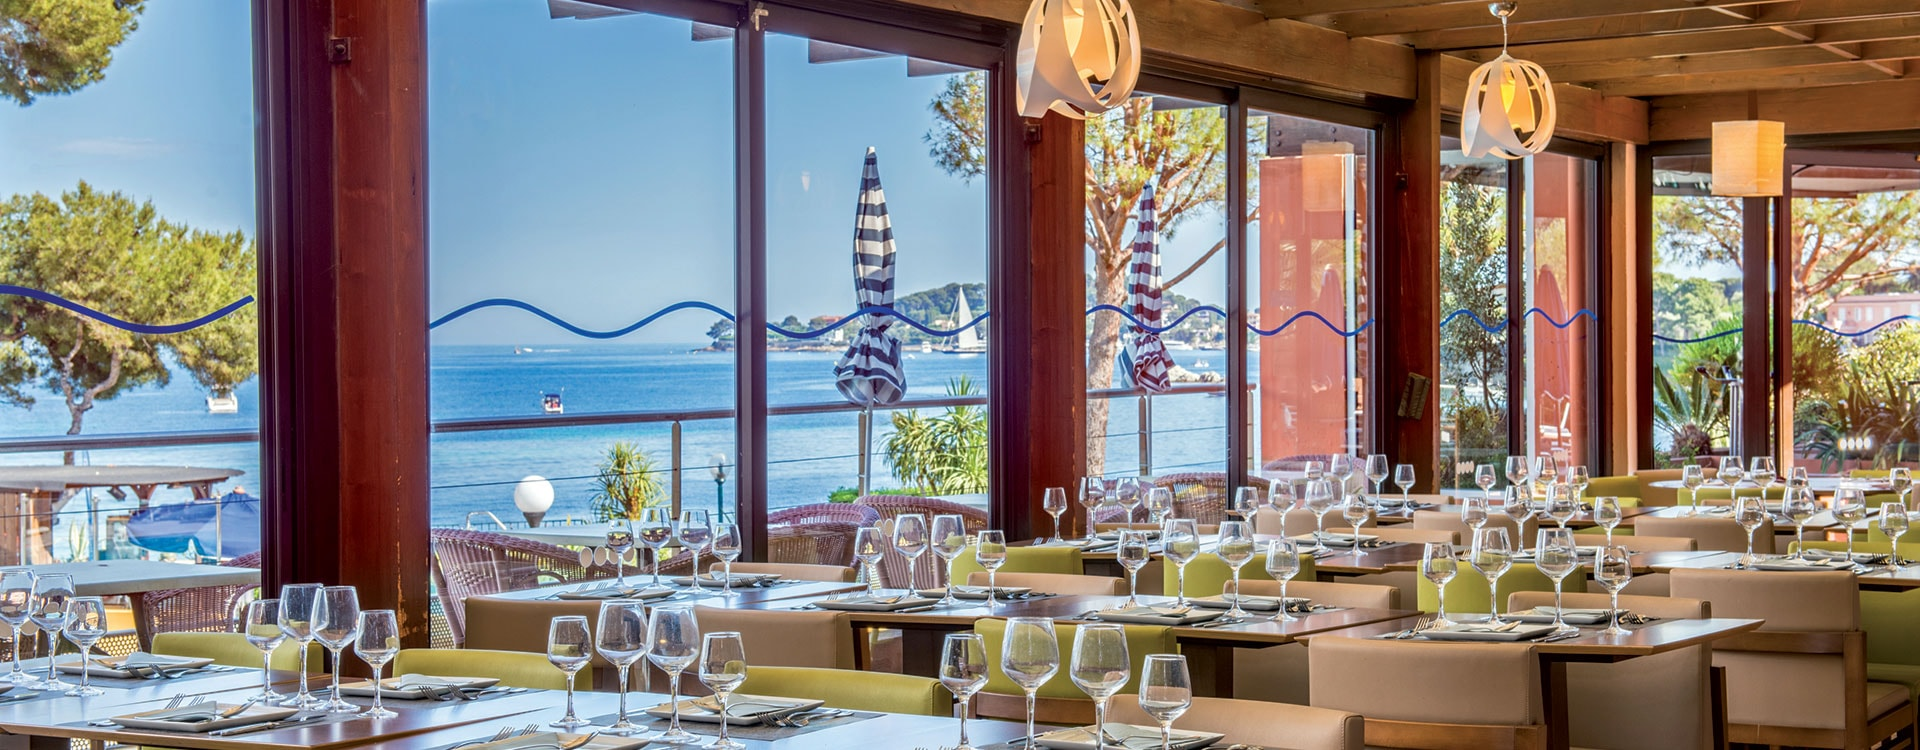 Restaurant Delcloy